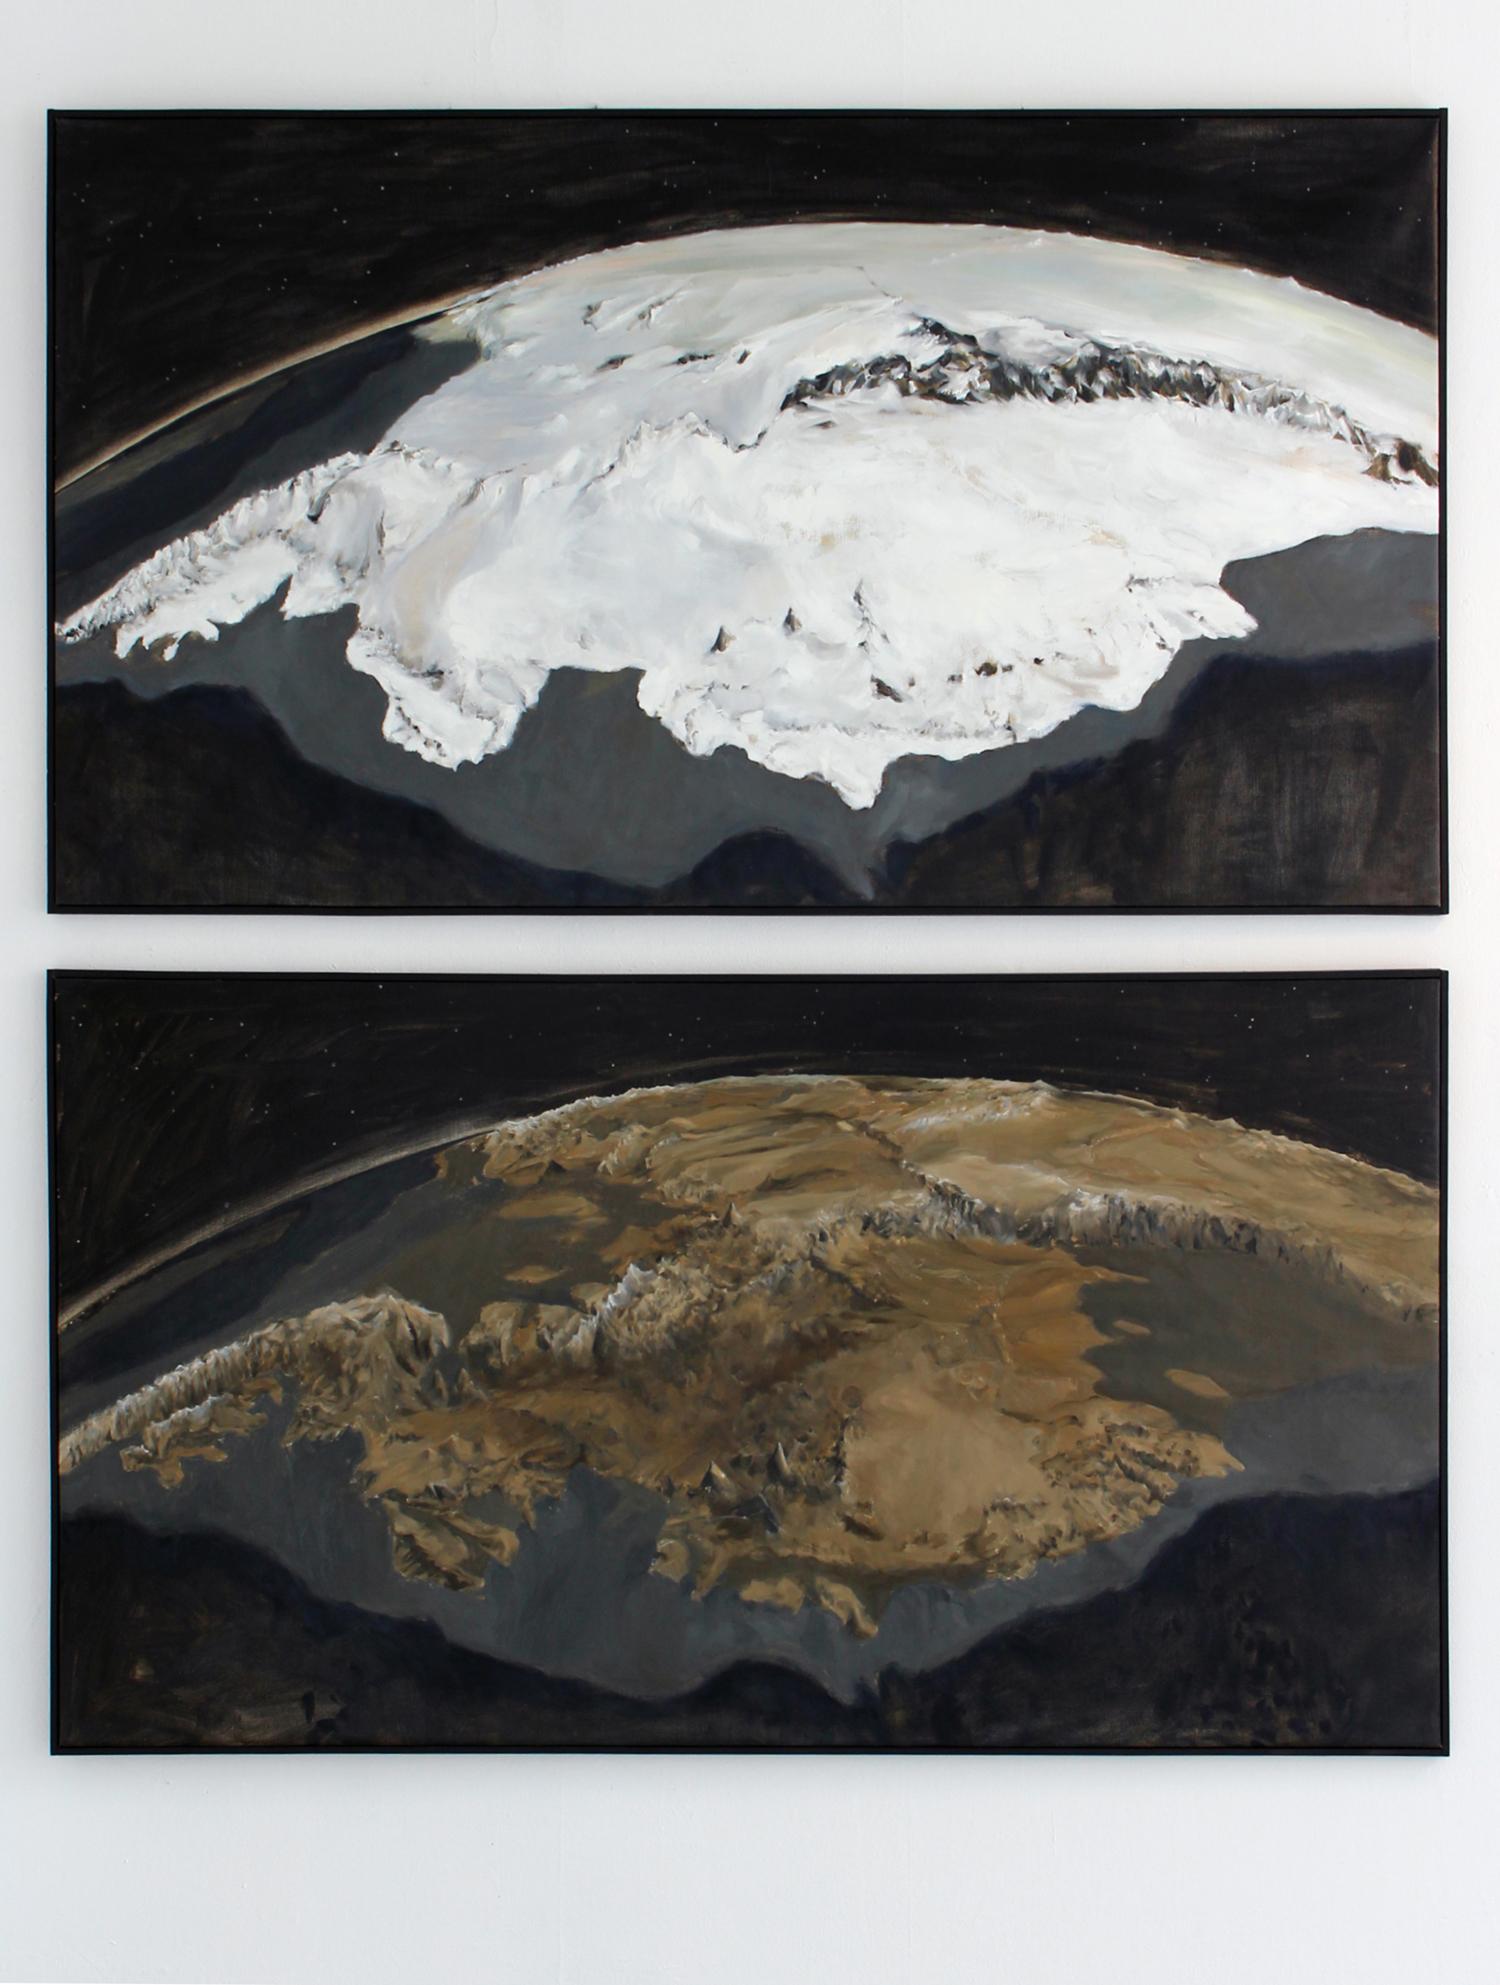 Antarctica Marie Byrd Land Icesheet/Bedrock